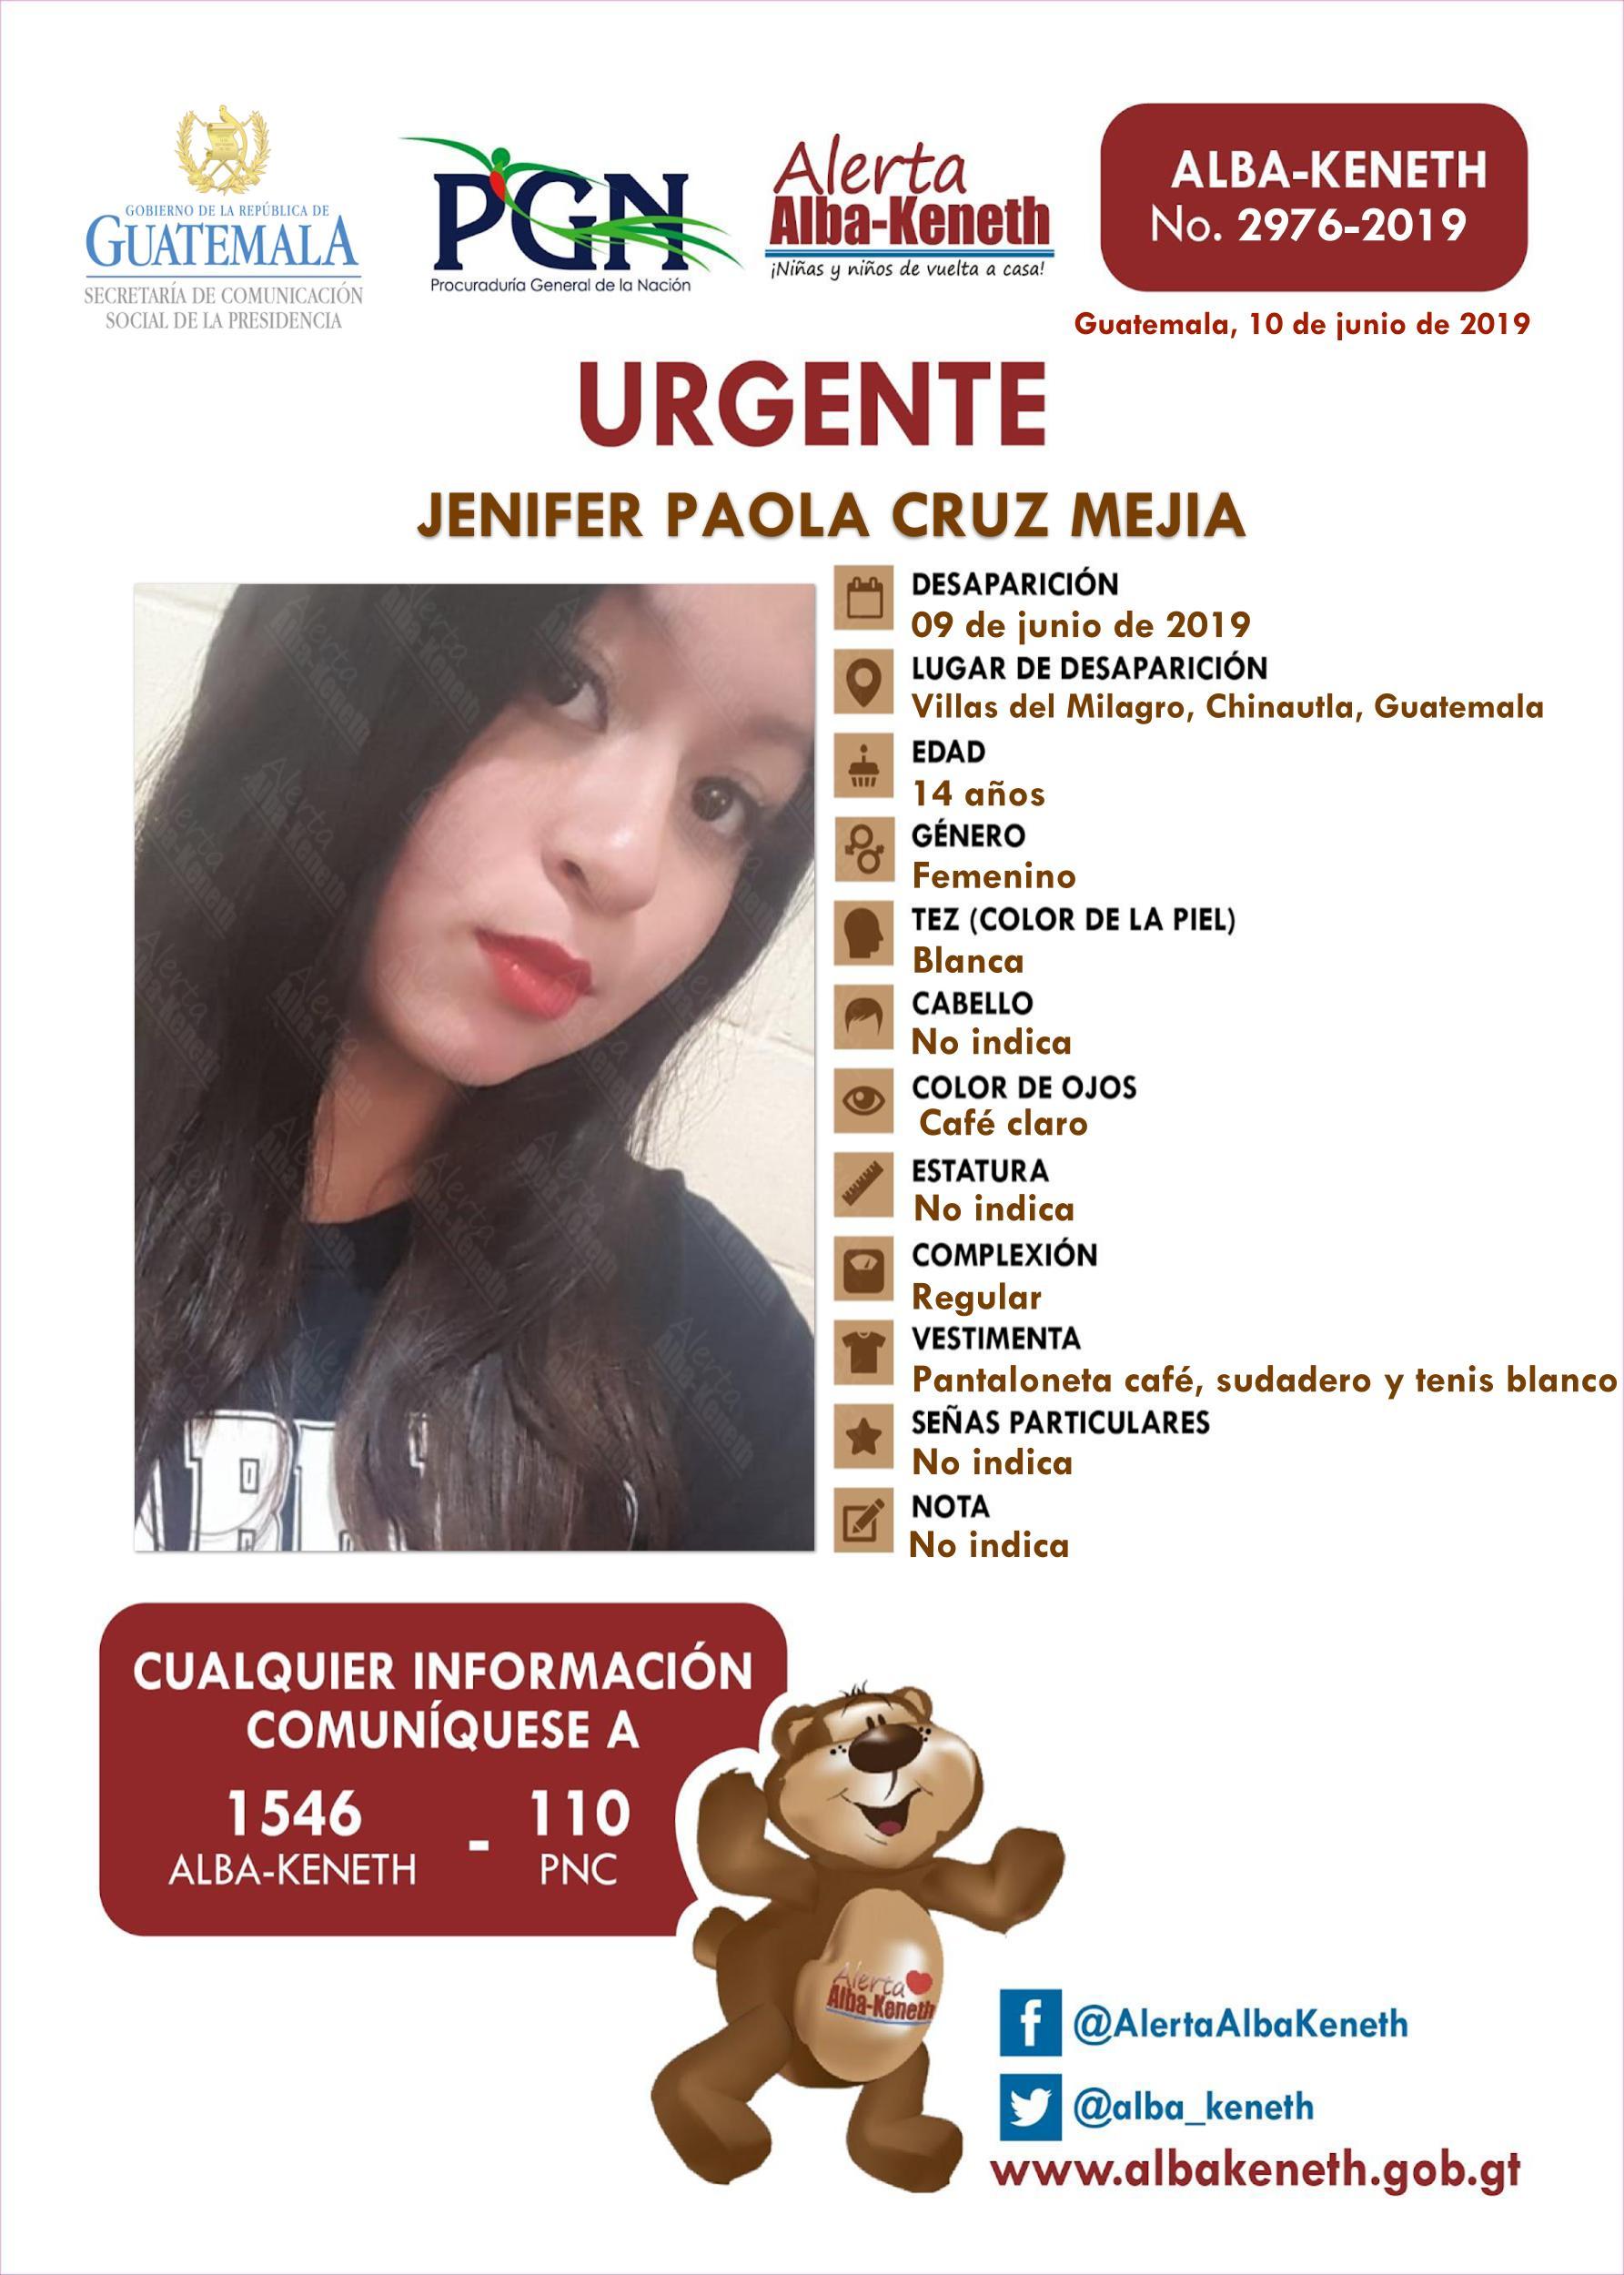 Jenifer Paola Cruz Mejia